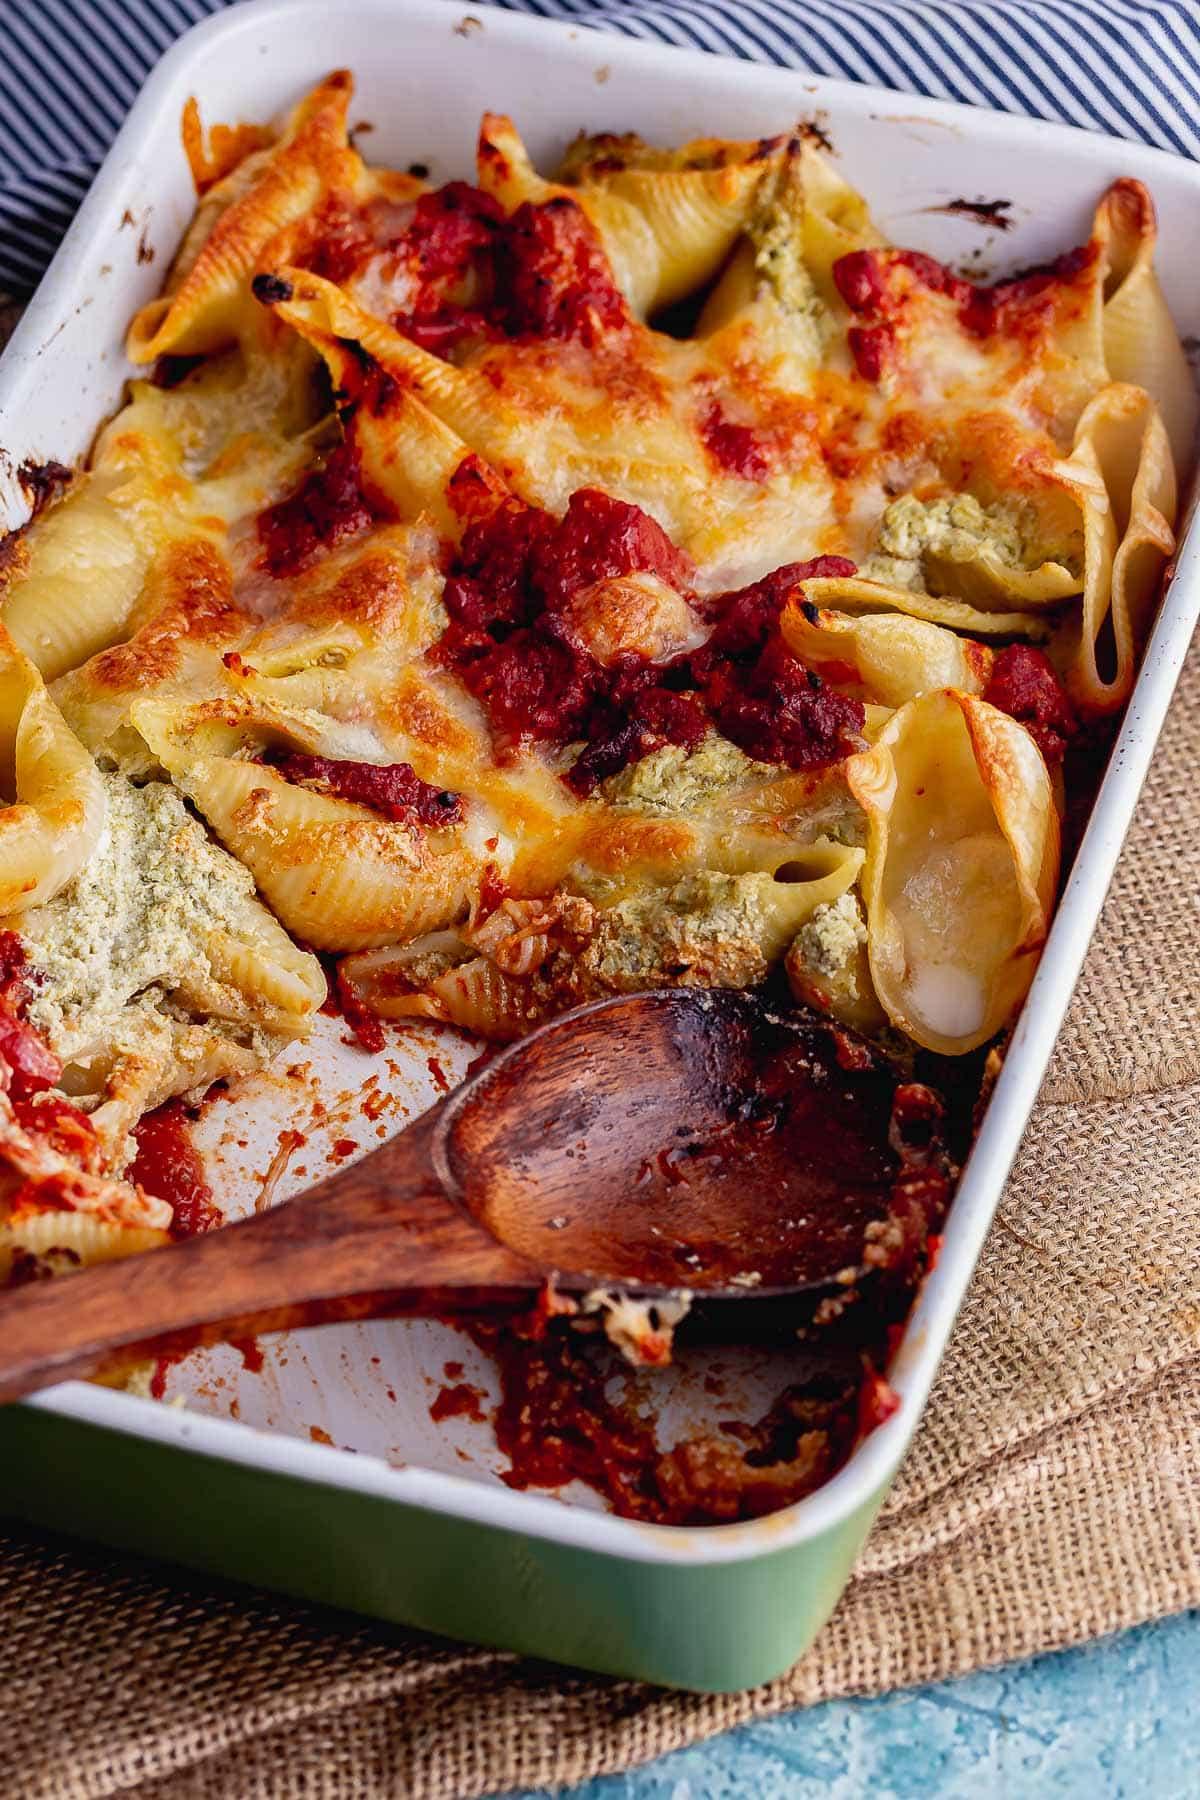 Pesto pasta bake with a wooden spoon